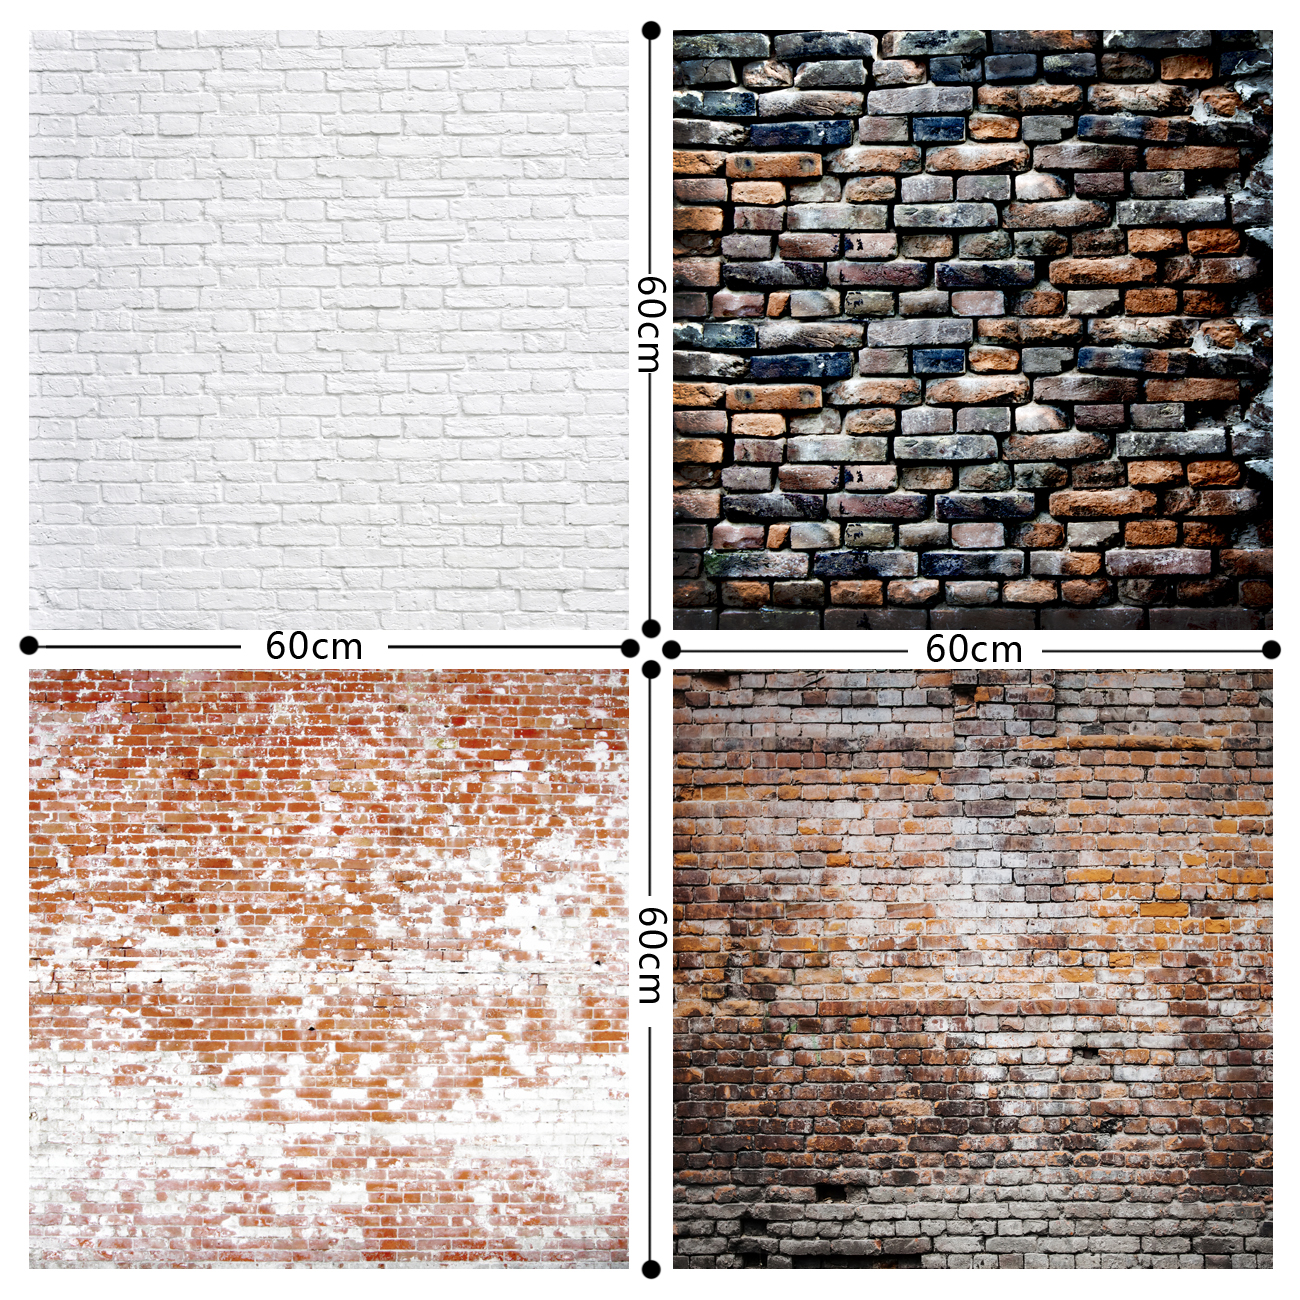 HUAYI Brick Paper Backdrop Vinyl Backdrop Brick Wall Photography Backdrops Photo Props Background Brick 4 pairs 0.6x0.6m GY-019